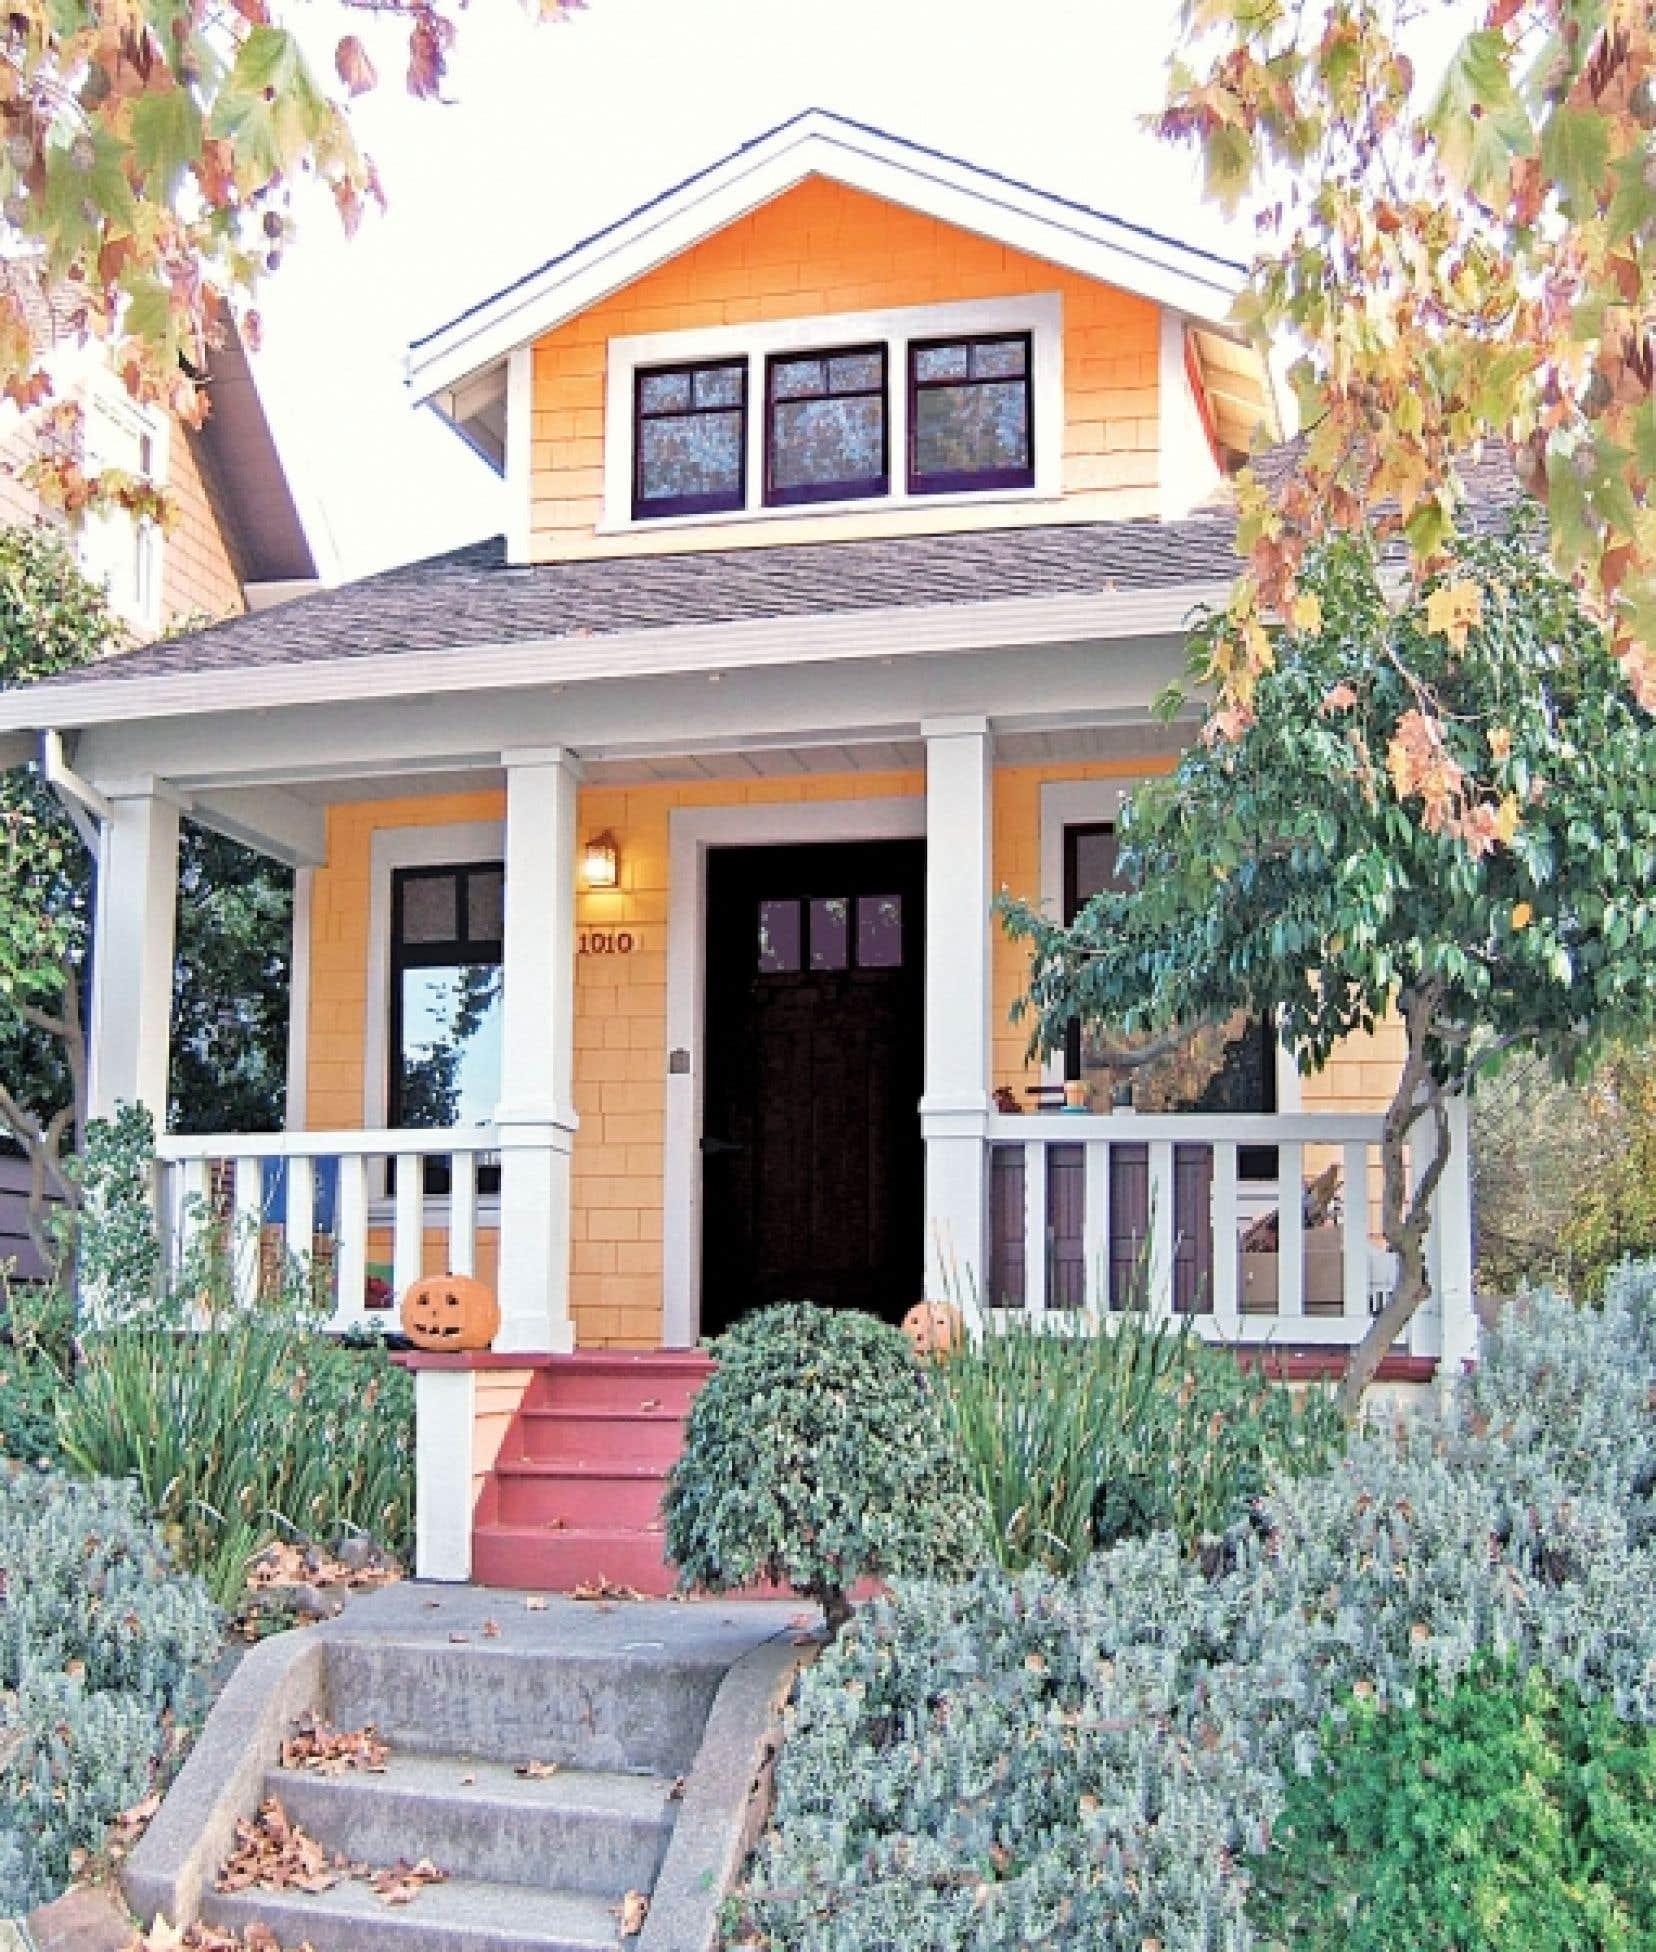 Tumbleweed Tiny House Cottages: Une Maison Pour Emporter